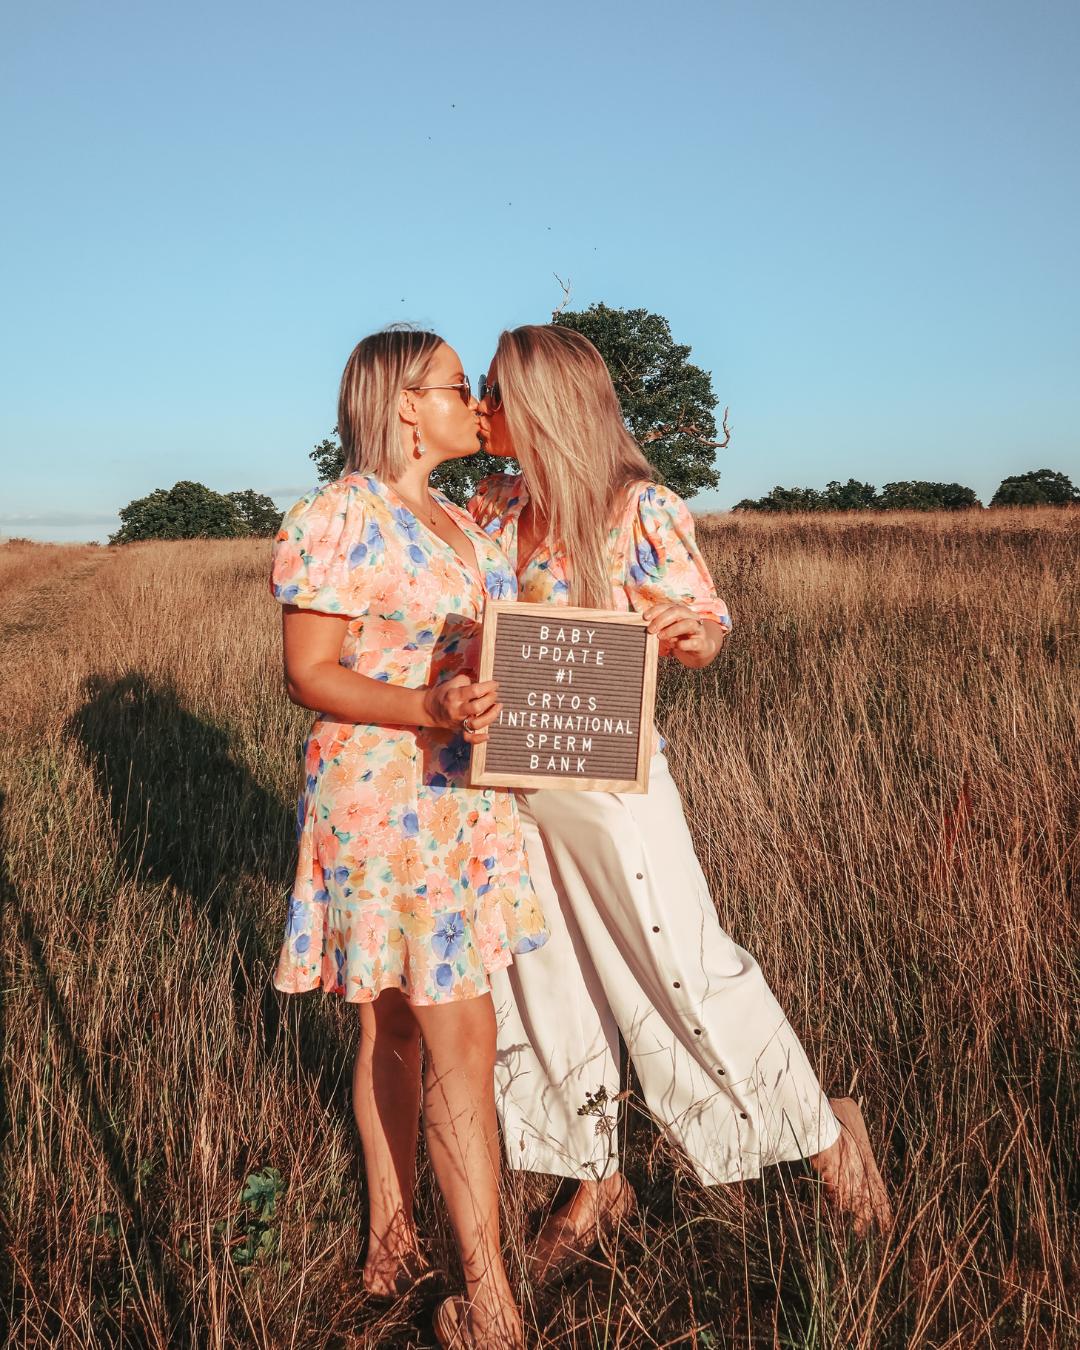 lesbian couple announces chosen sperm bank, cryos international